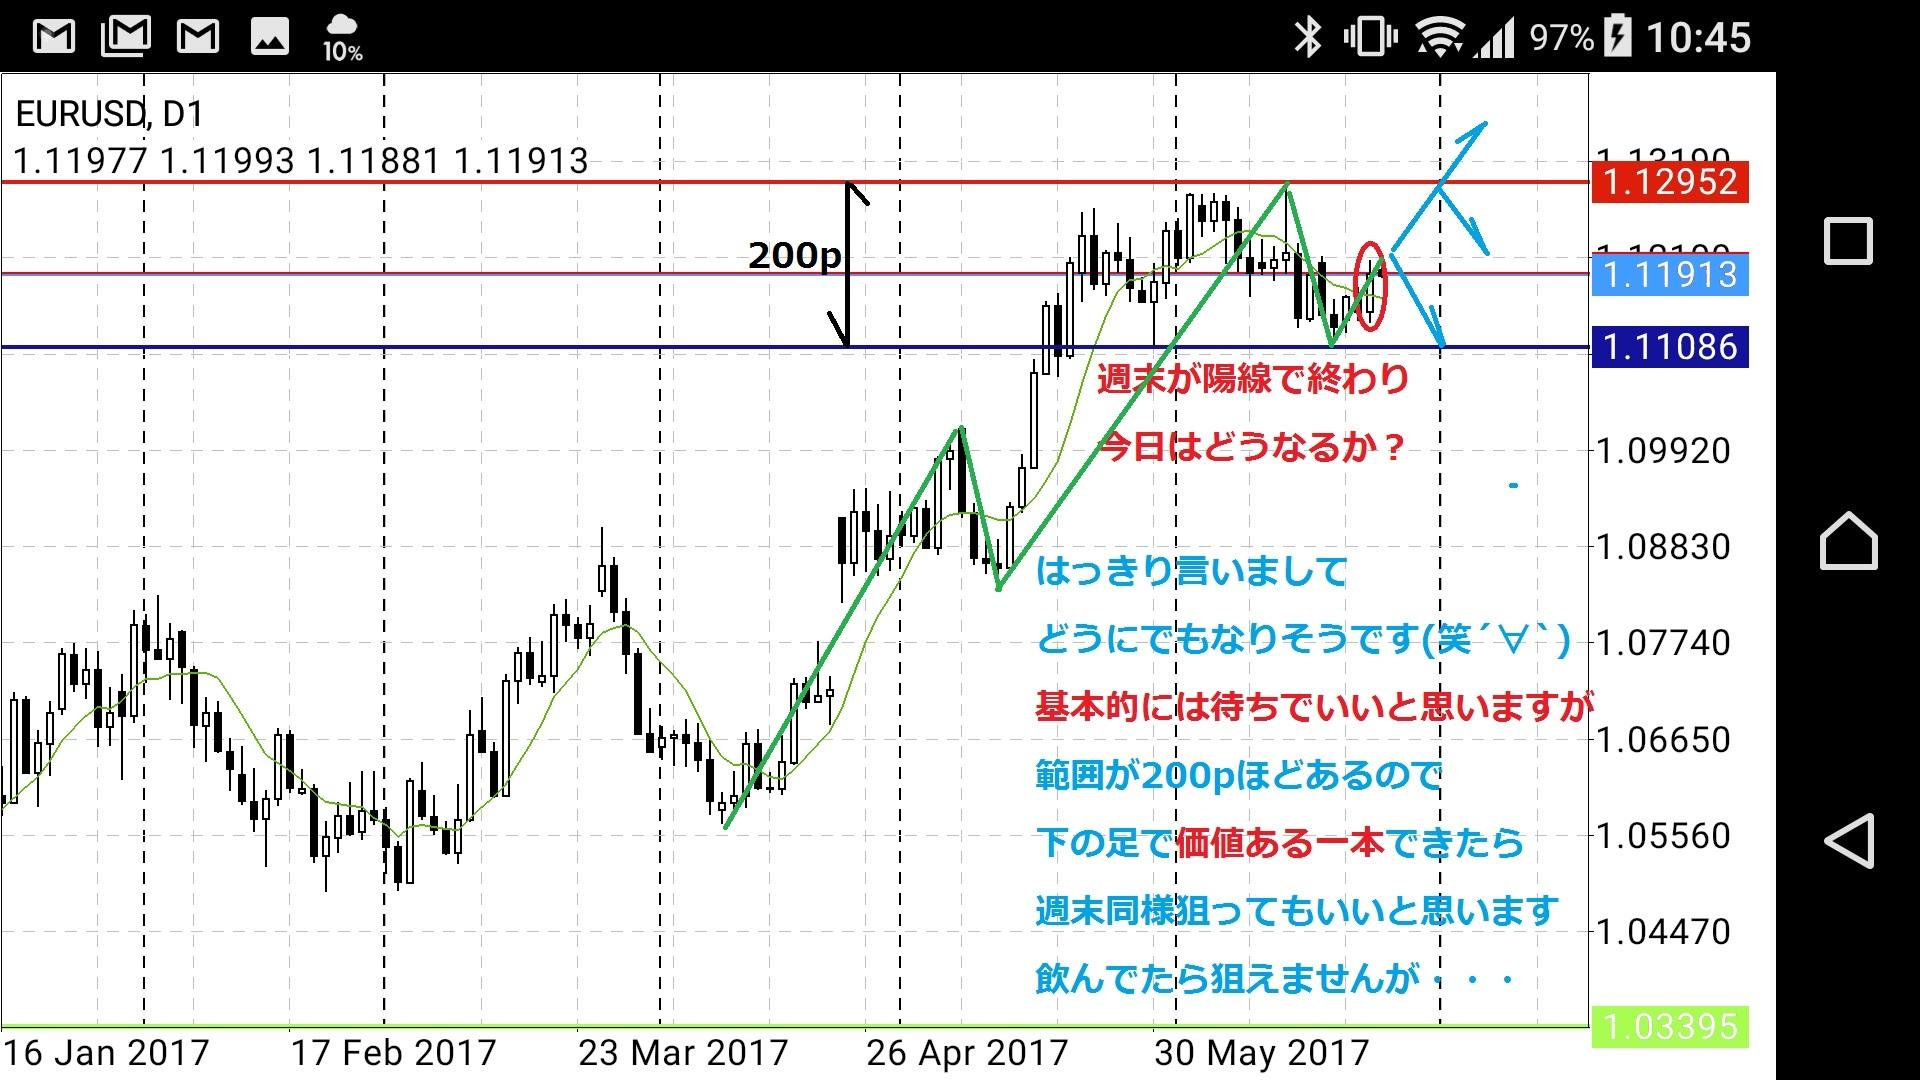 20170626142002ed3.jpg